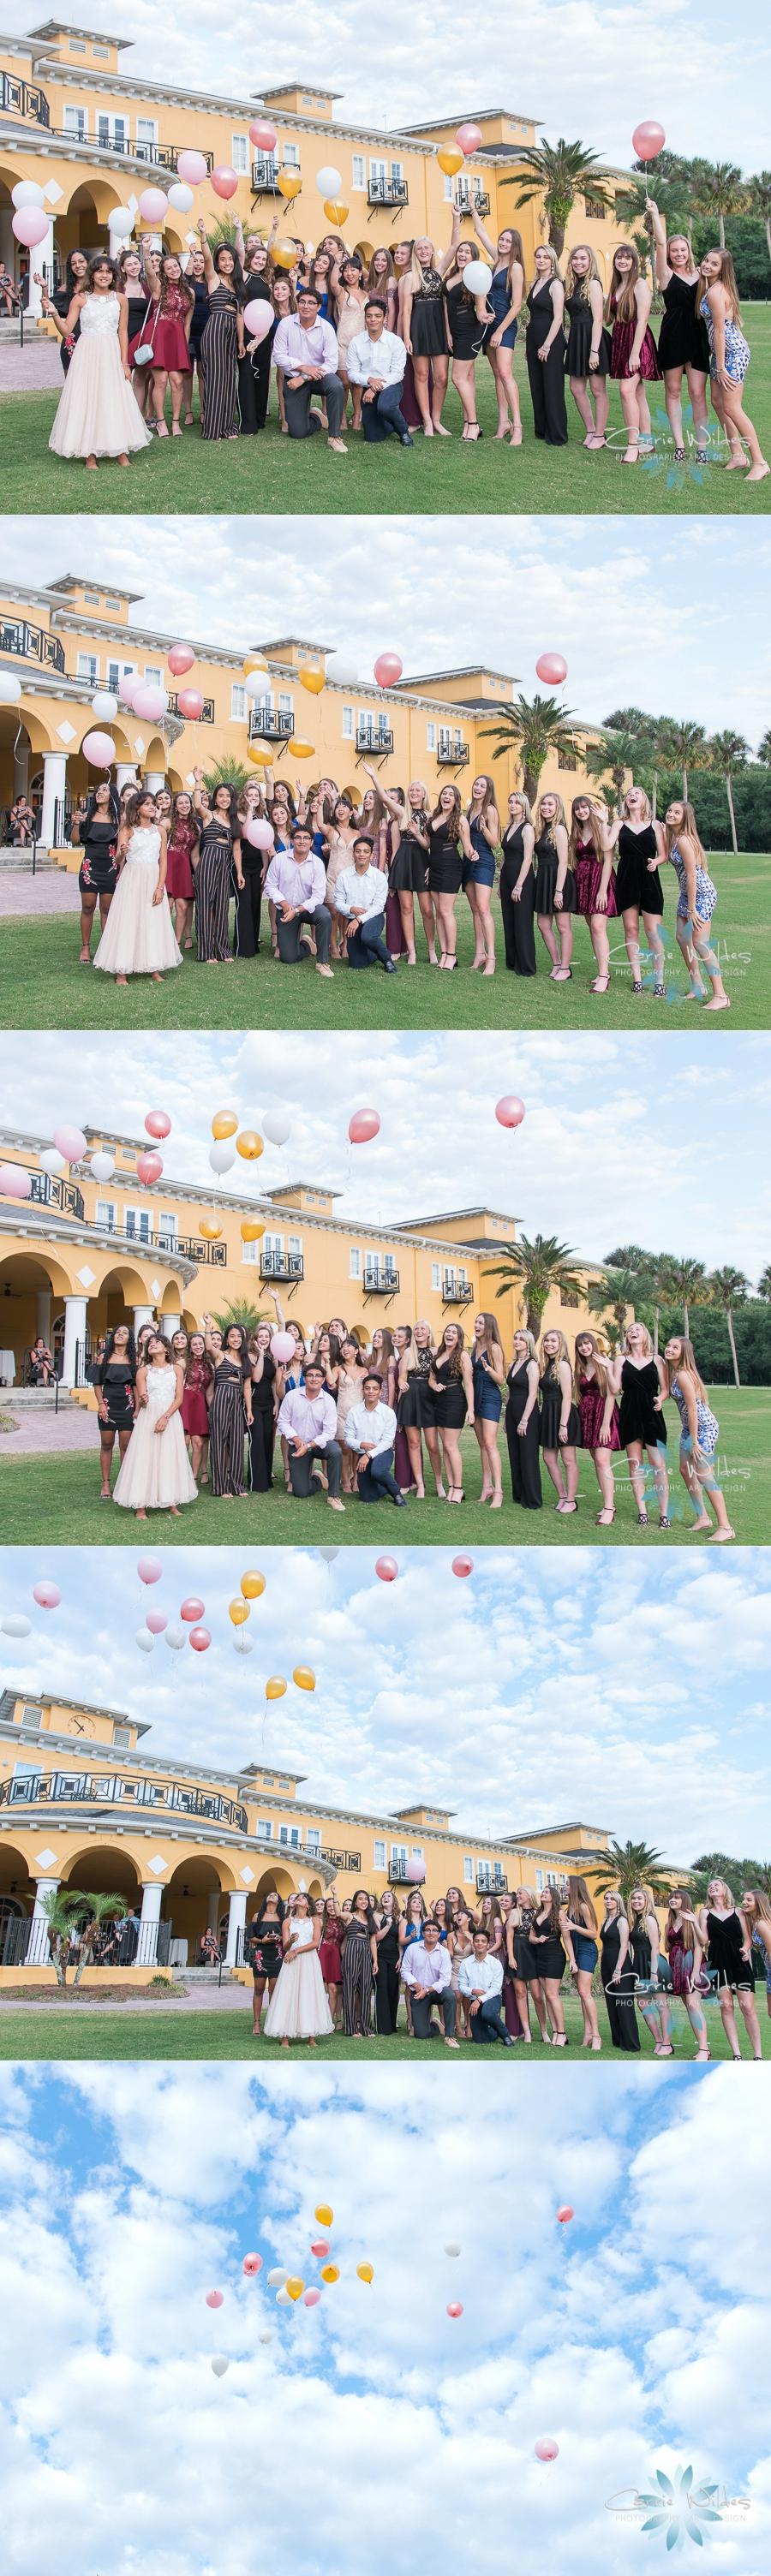 4_13_19 Angelea Sweet 16 Tampa Palms Golf and Country Club_0002.jpg